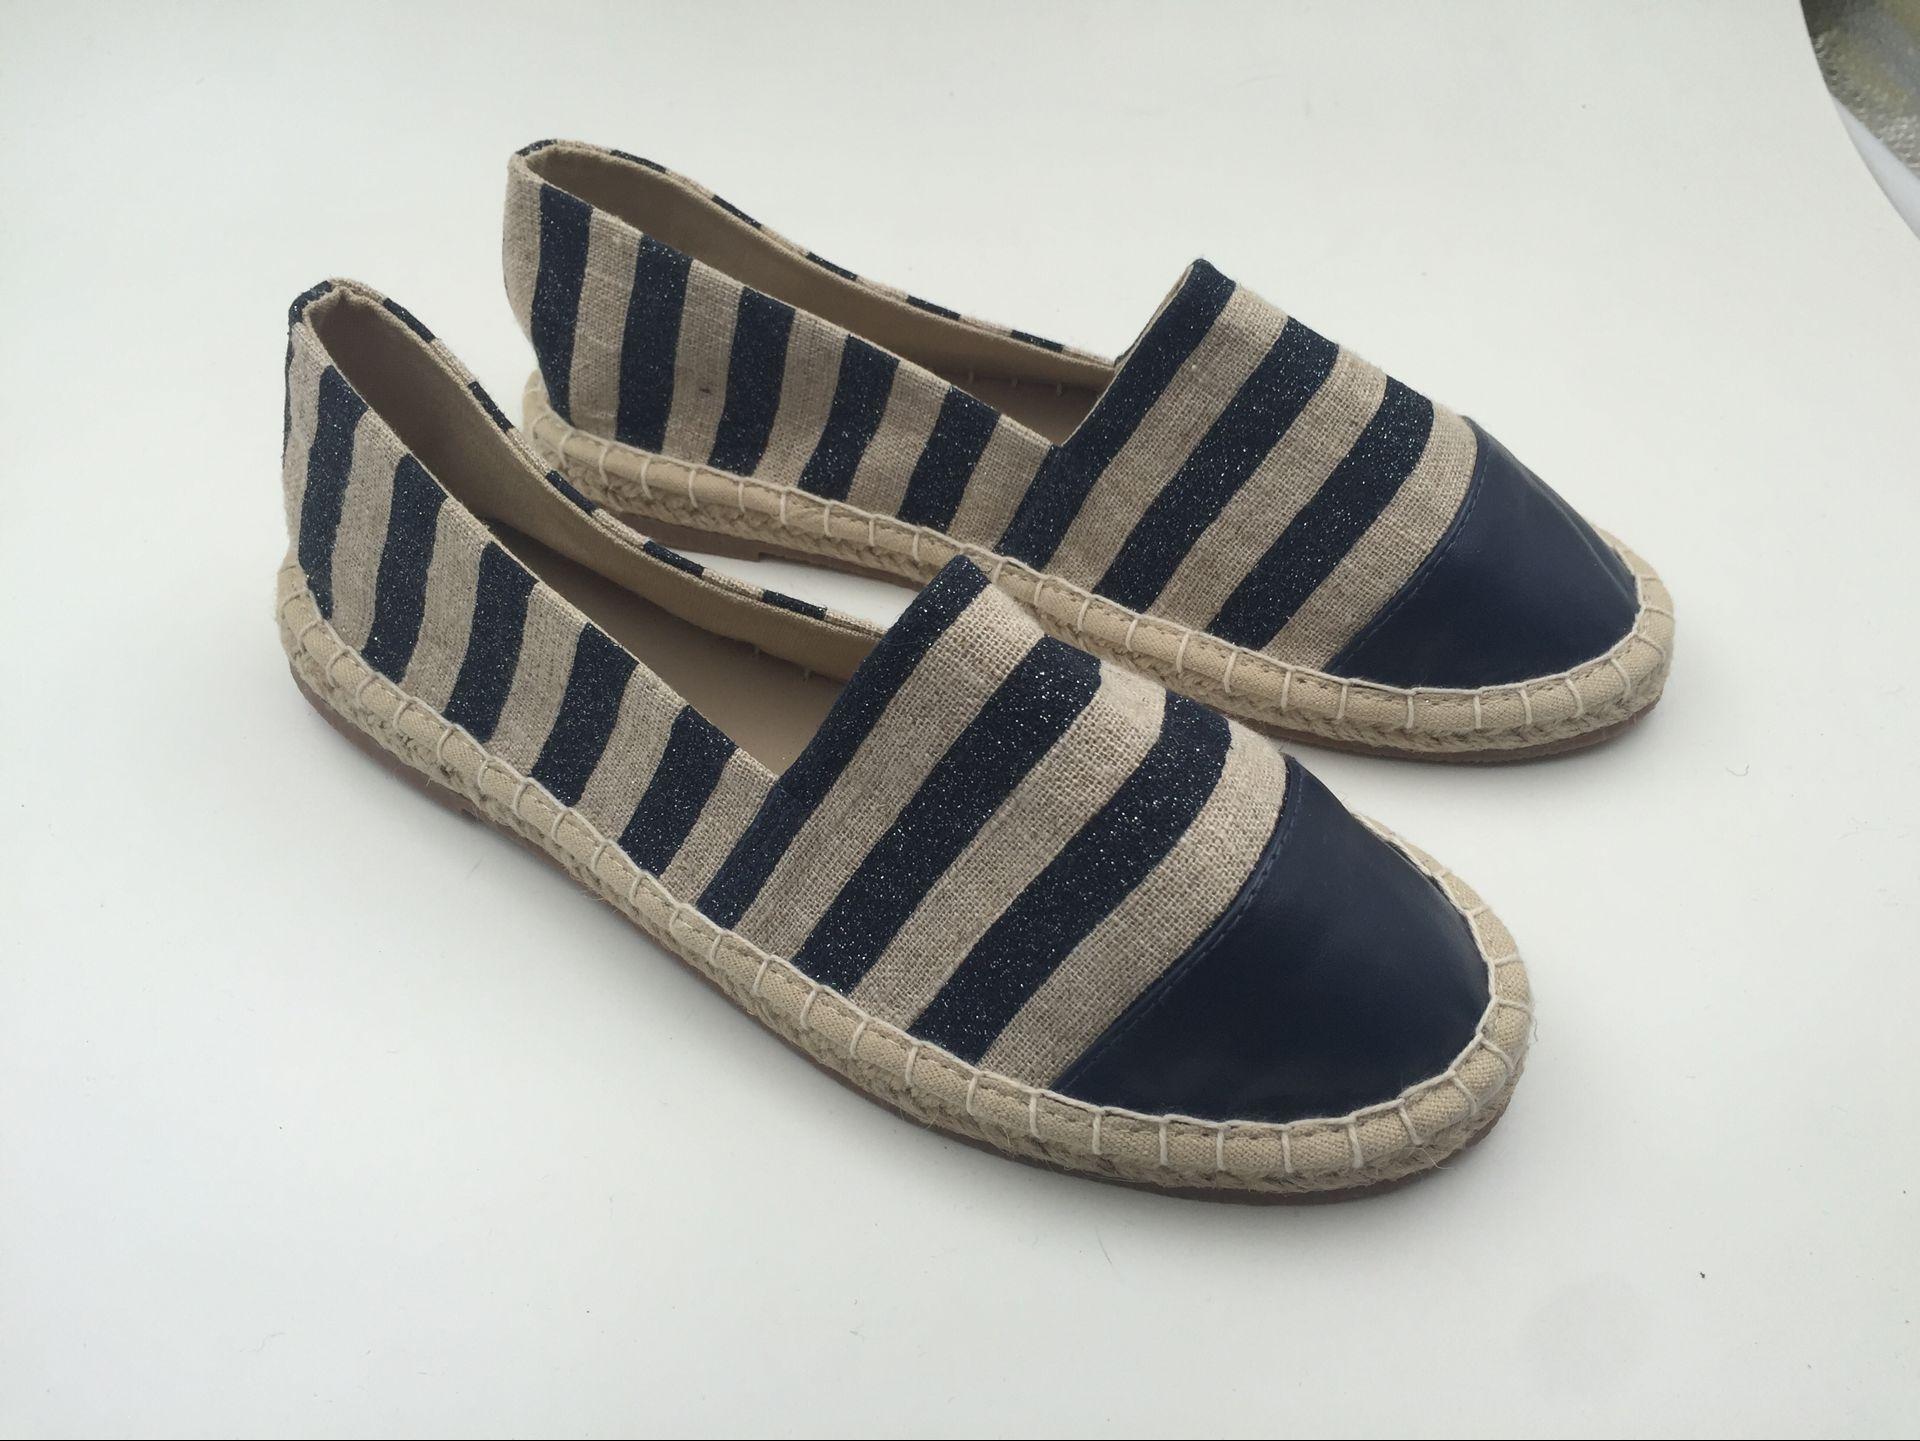 Stylish Women Espadrilles Ladie Flat Hemp Shoes